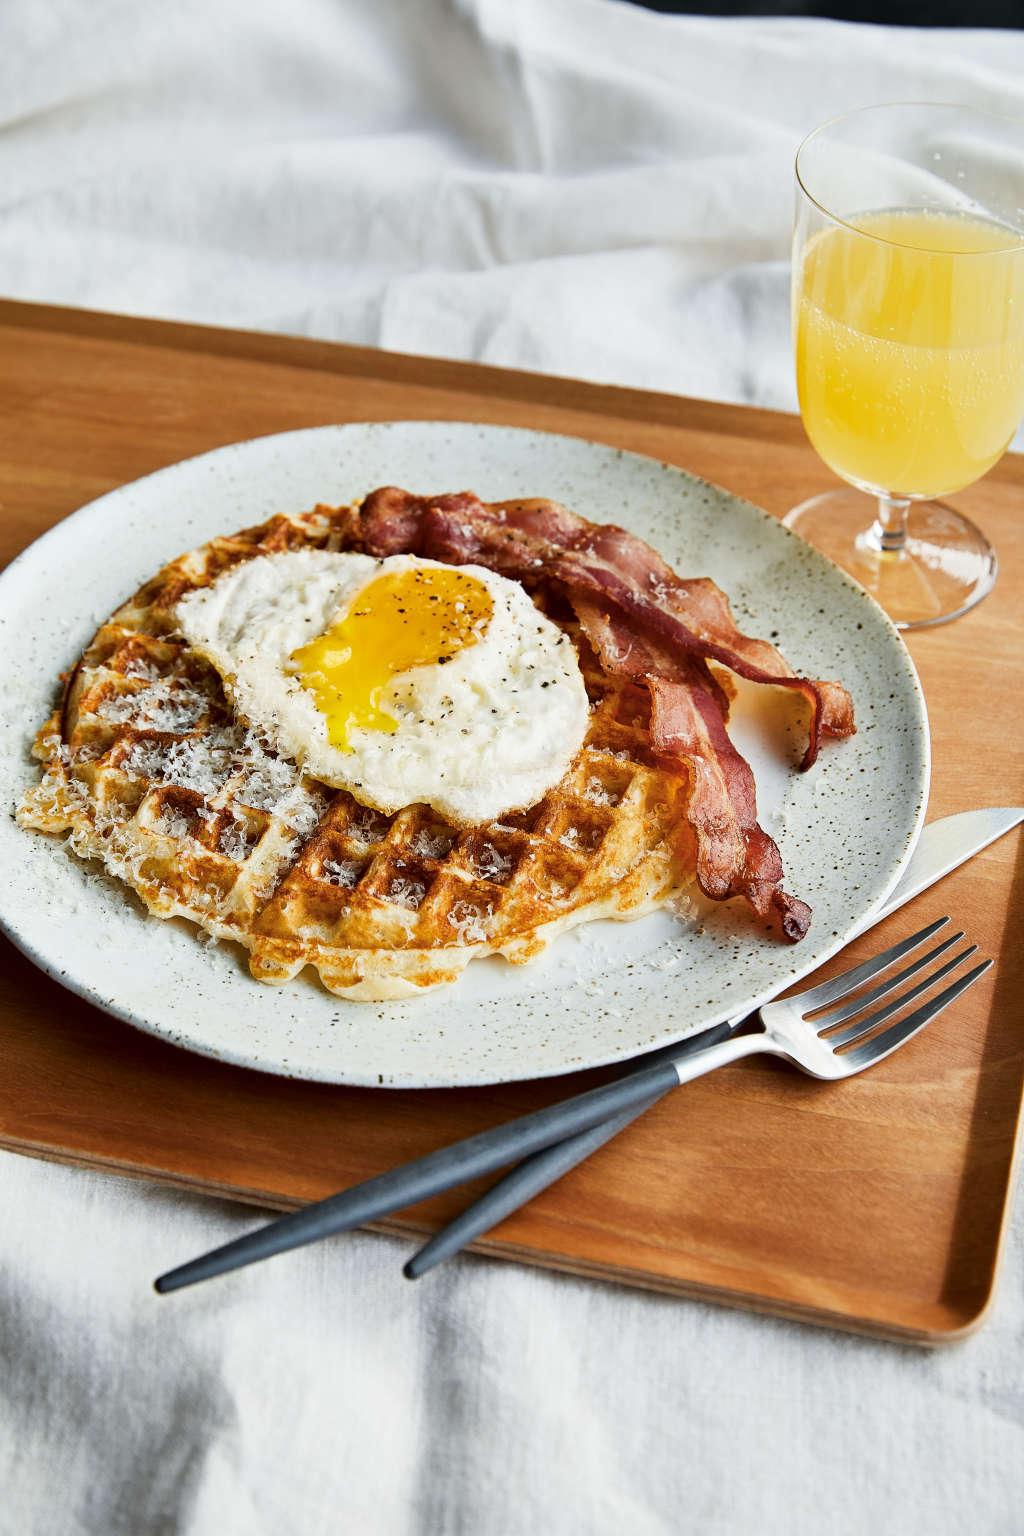 The Surprising Ingredient Chrissy Teigen Adds to Her Waffles